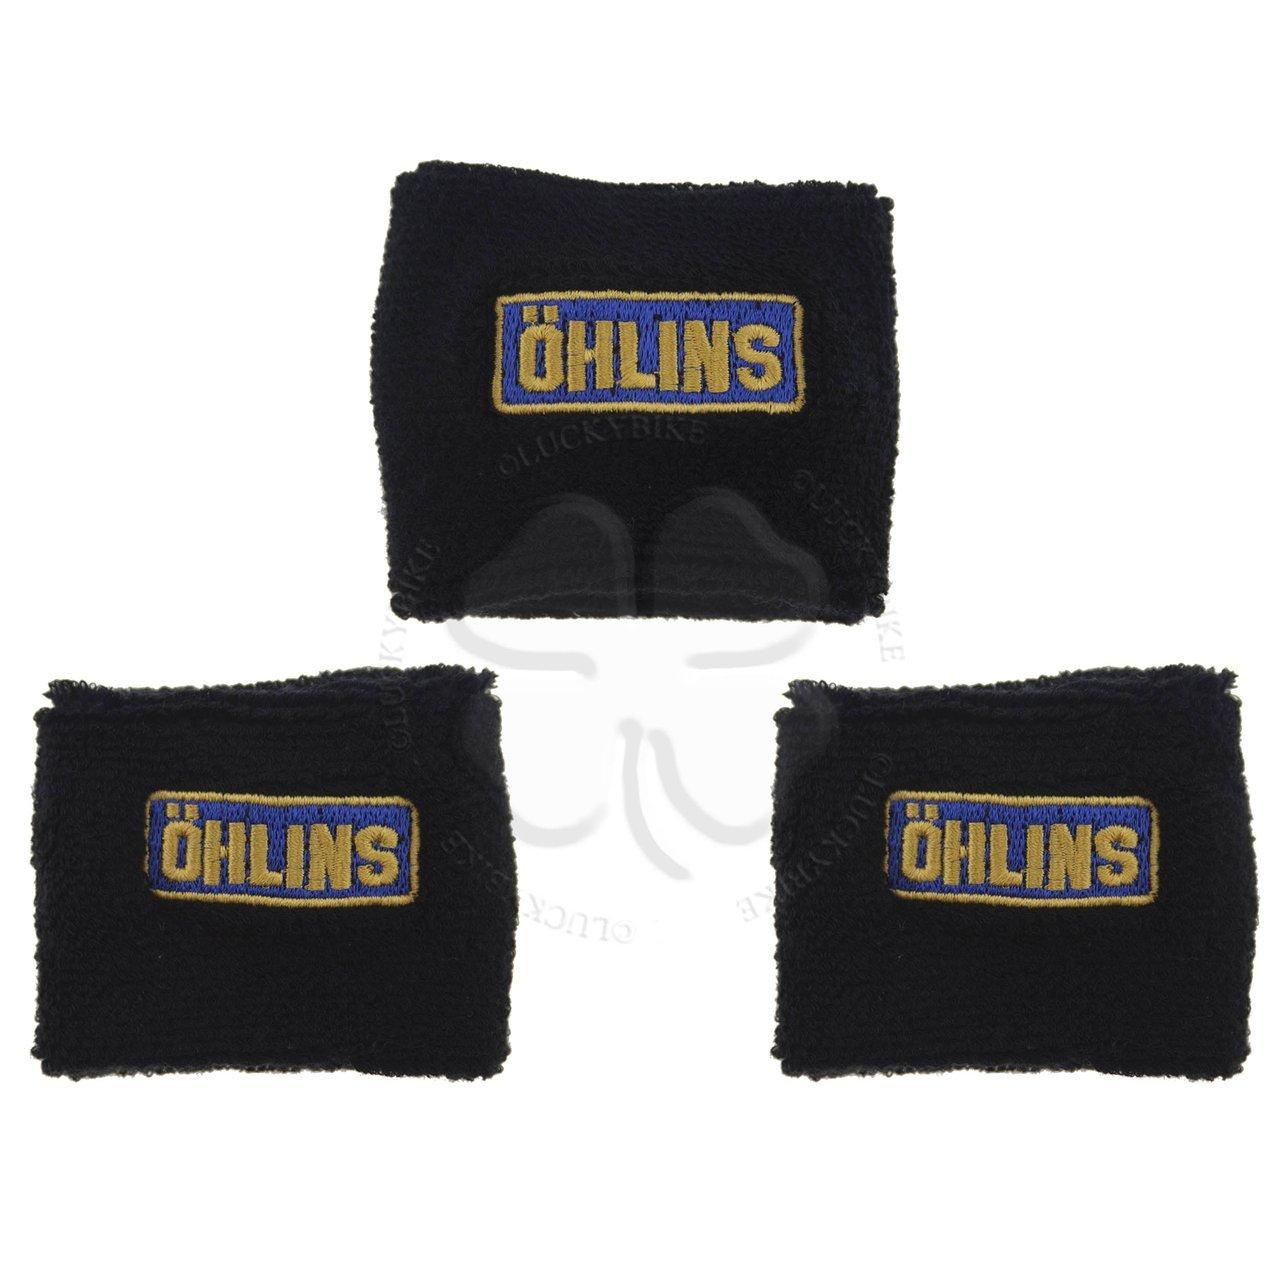 Reservoir Sock - Ohlins - Set -1x Large & 2x Small - Black